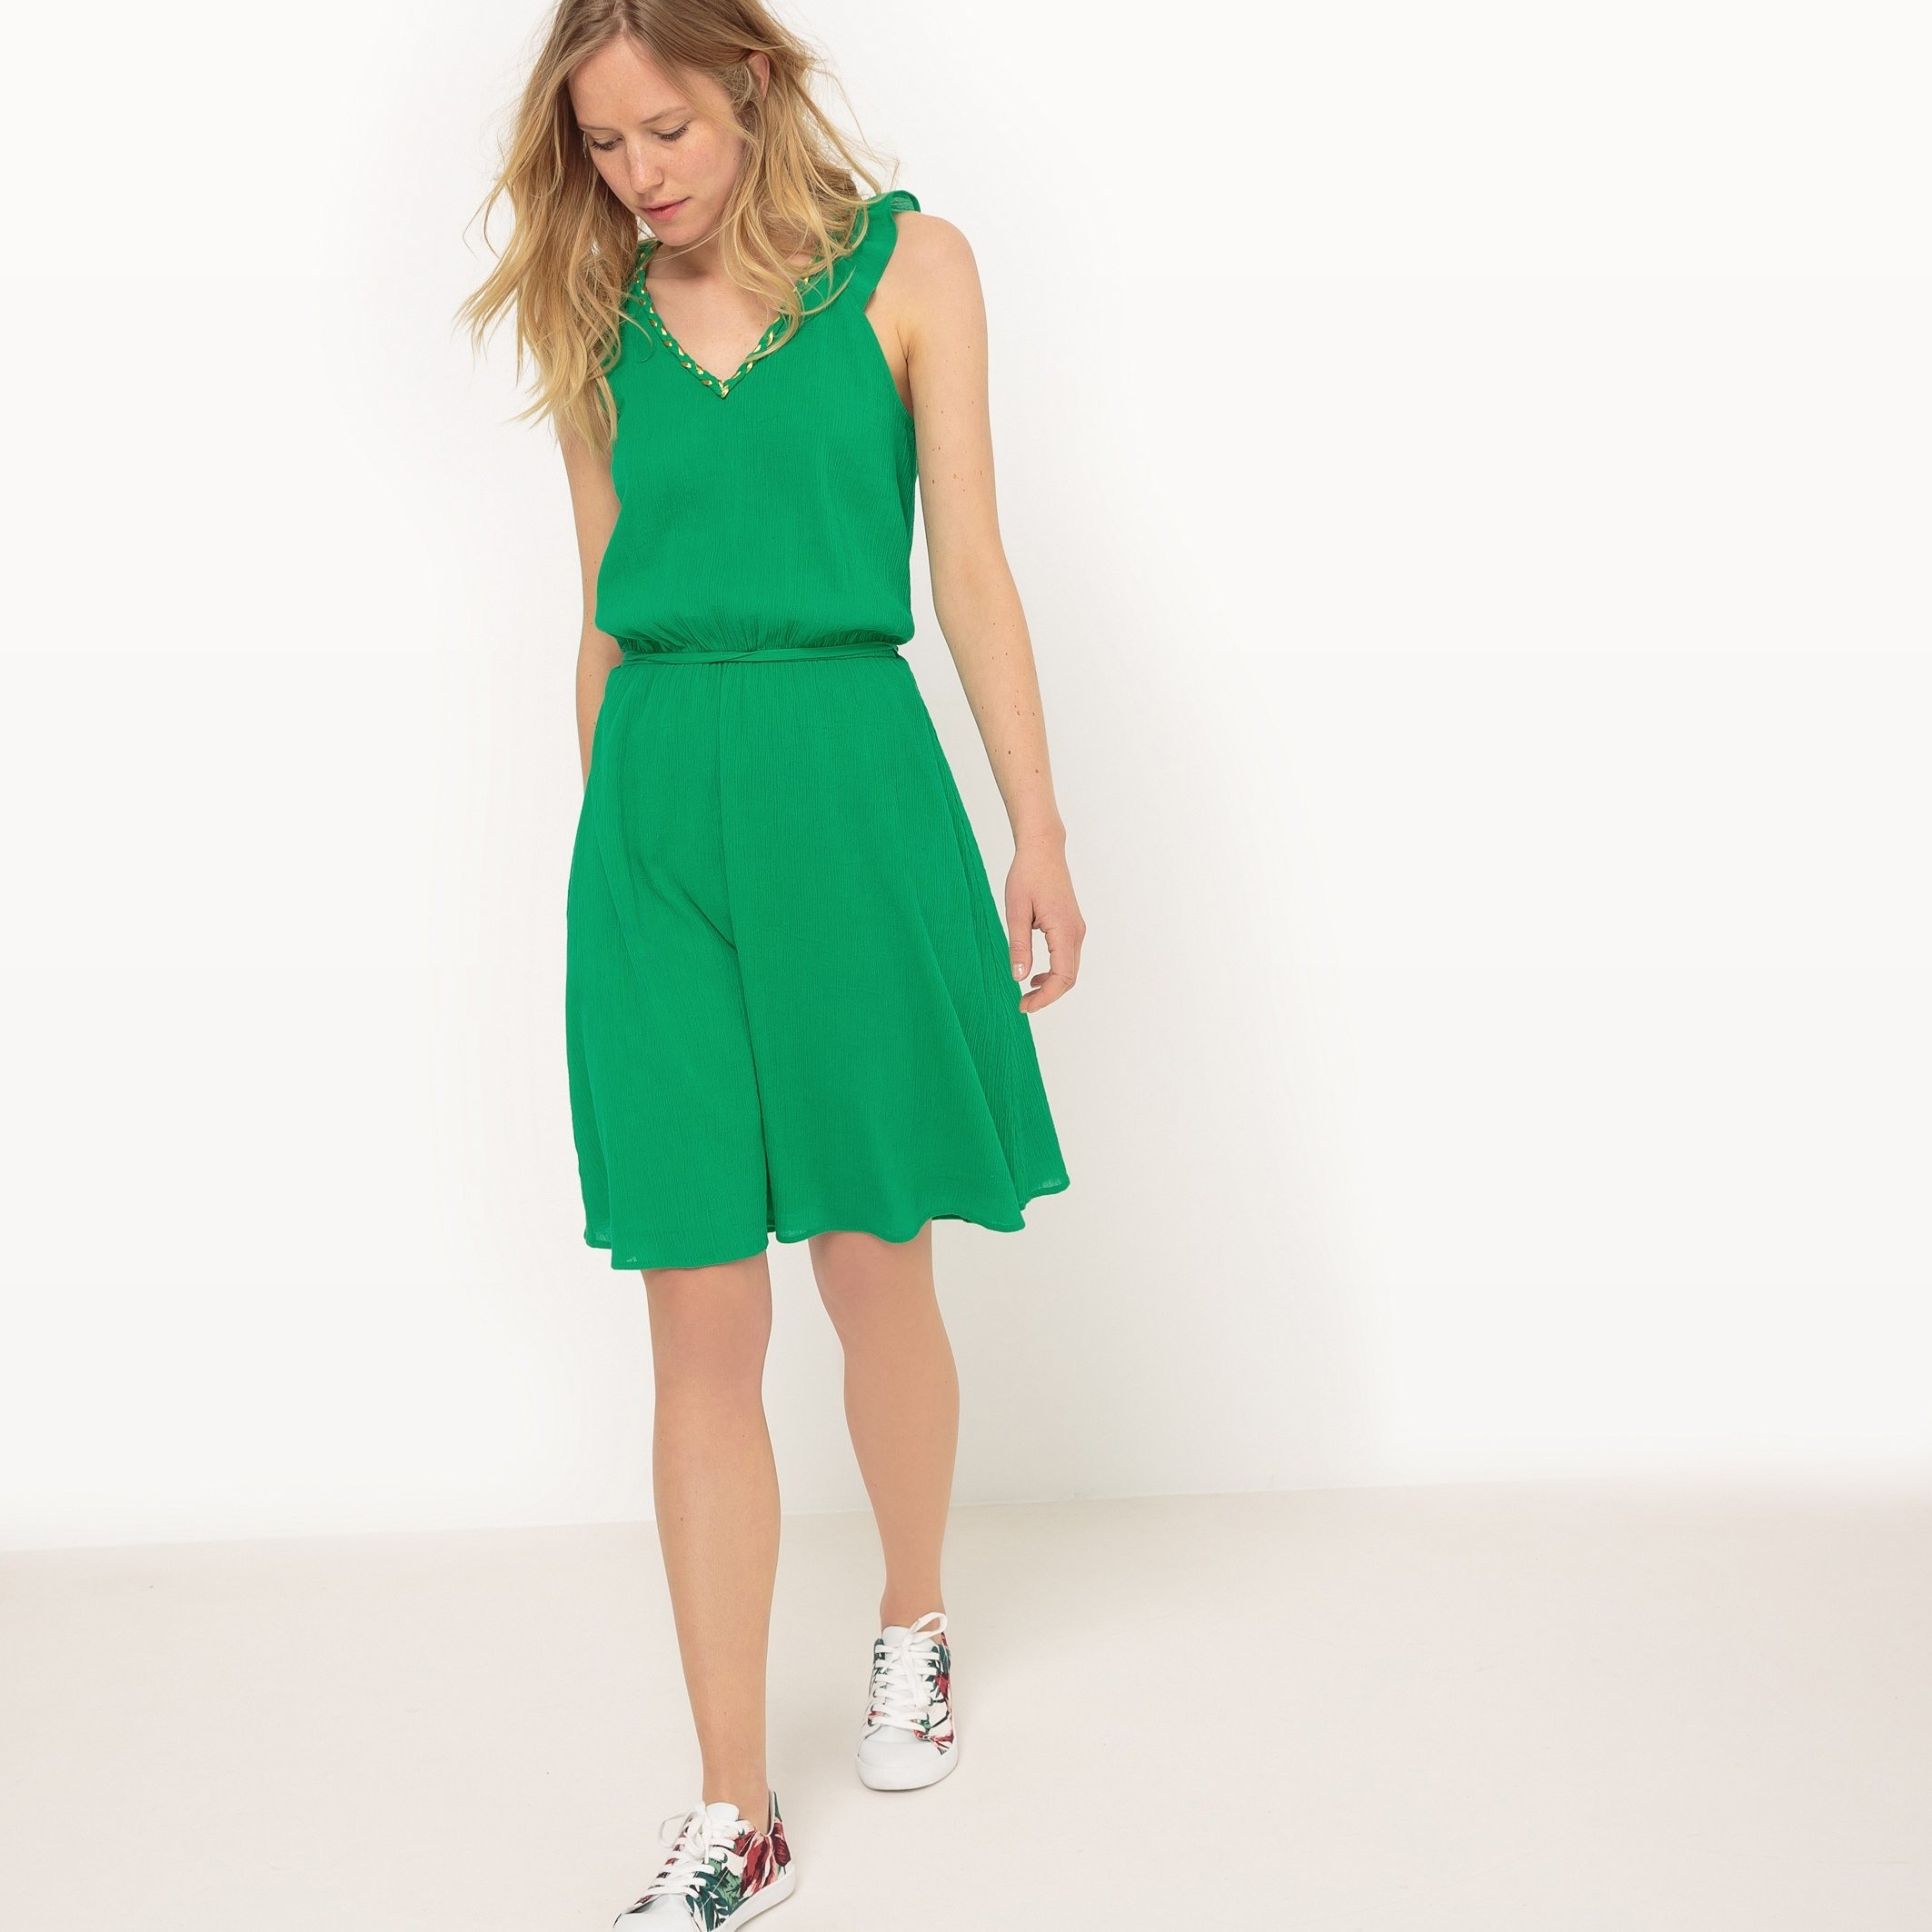 13 Cool Grünes Kurzes Kleid ÄrmelFormal Schön Grünes Kurzes Kleid Boutique